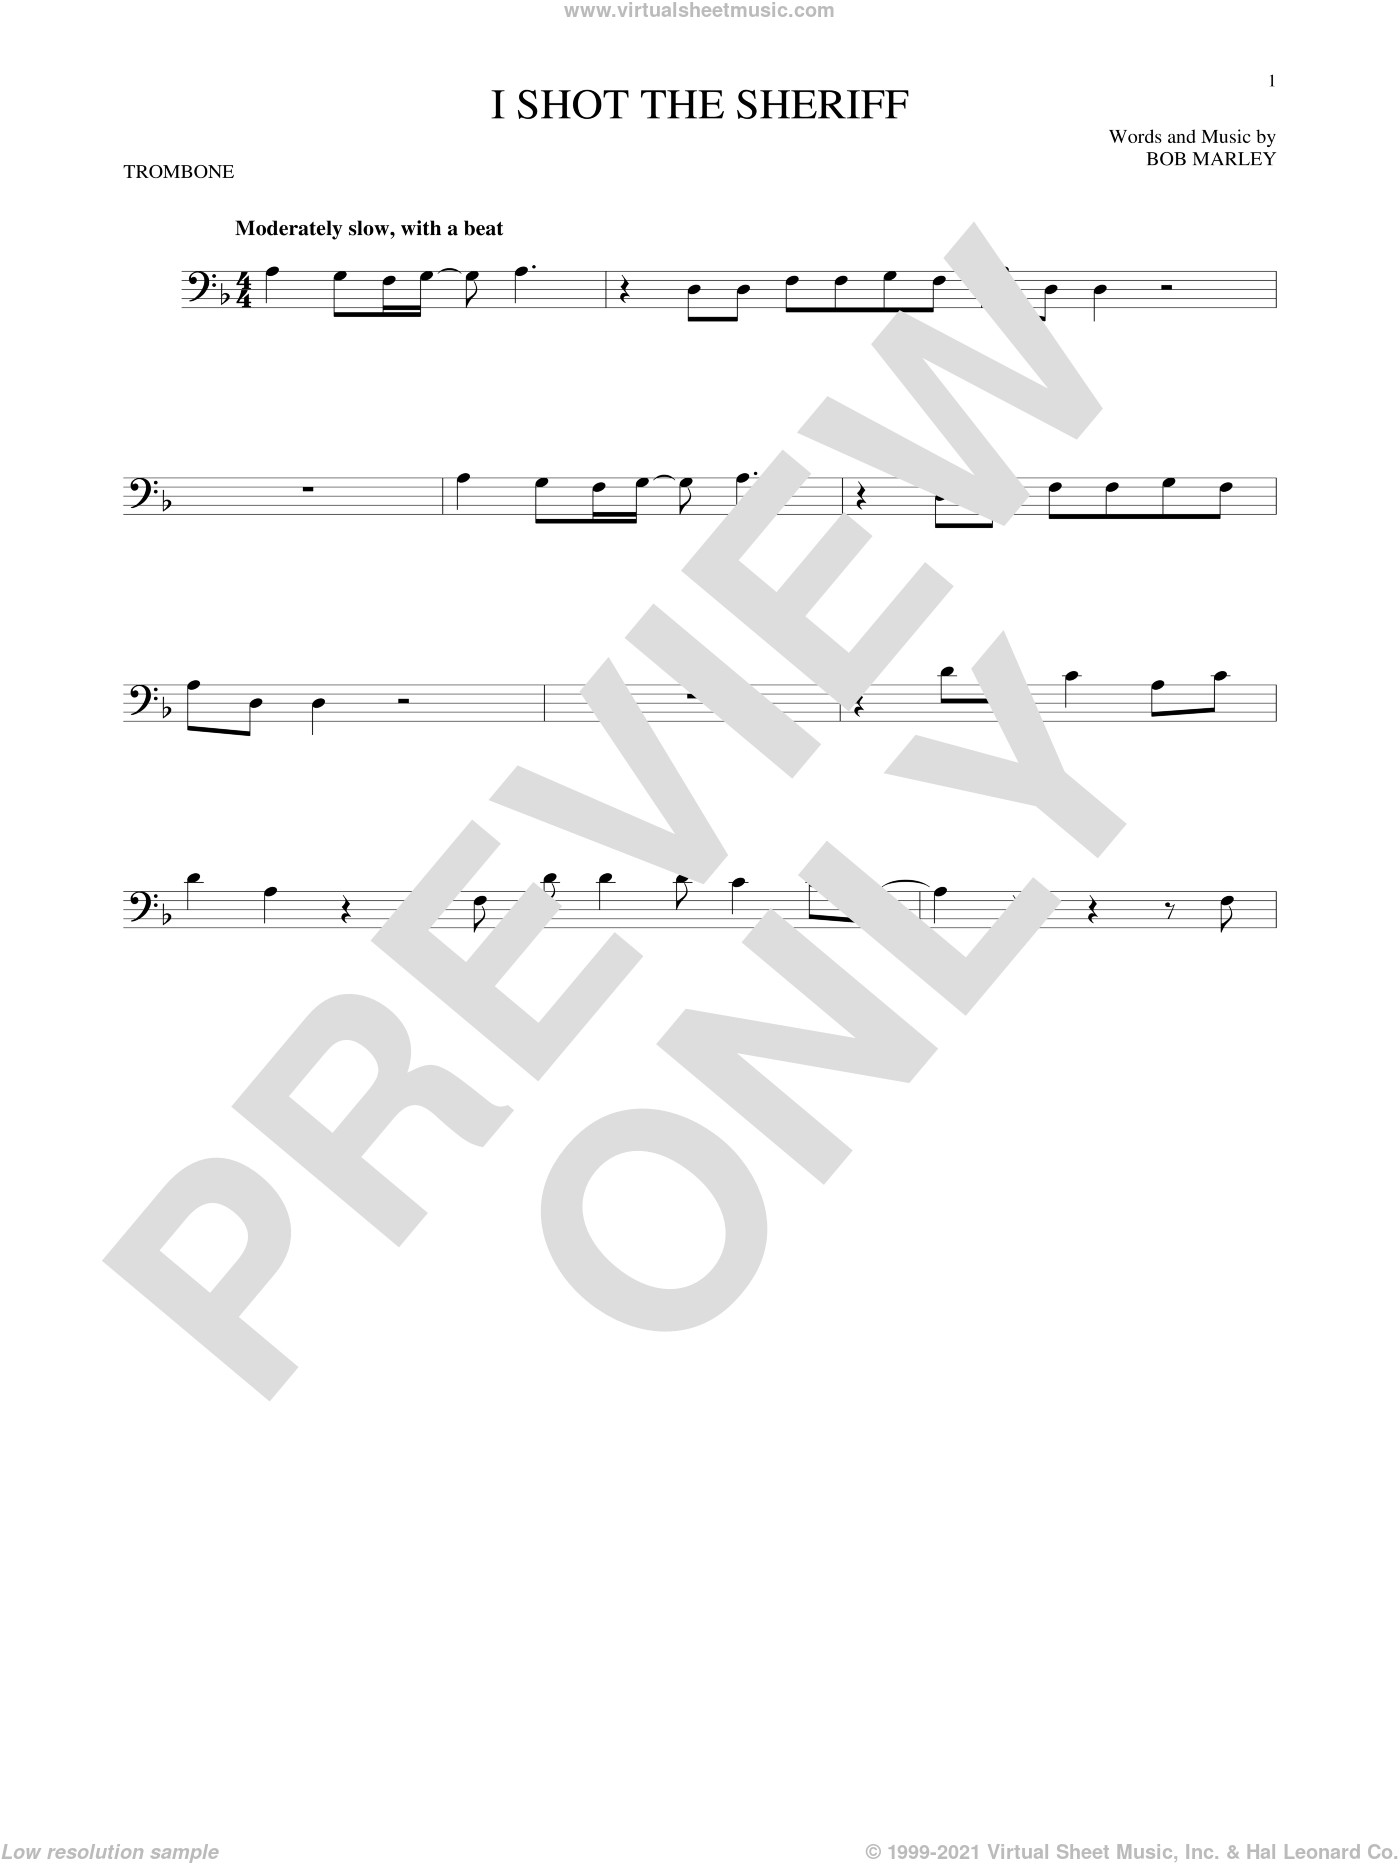 I Shot The Sheriff sheet music for trombone solo by Bob Marley, Eric Clapton and Warren G, intermediate skill level